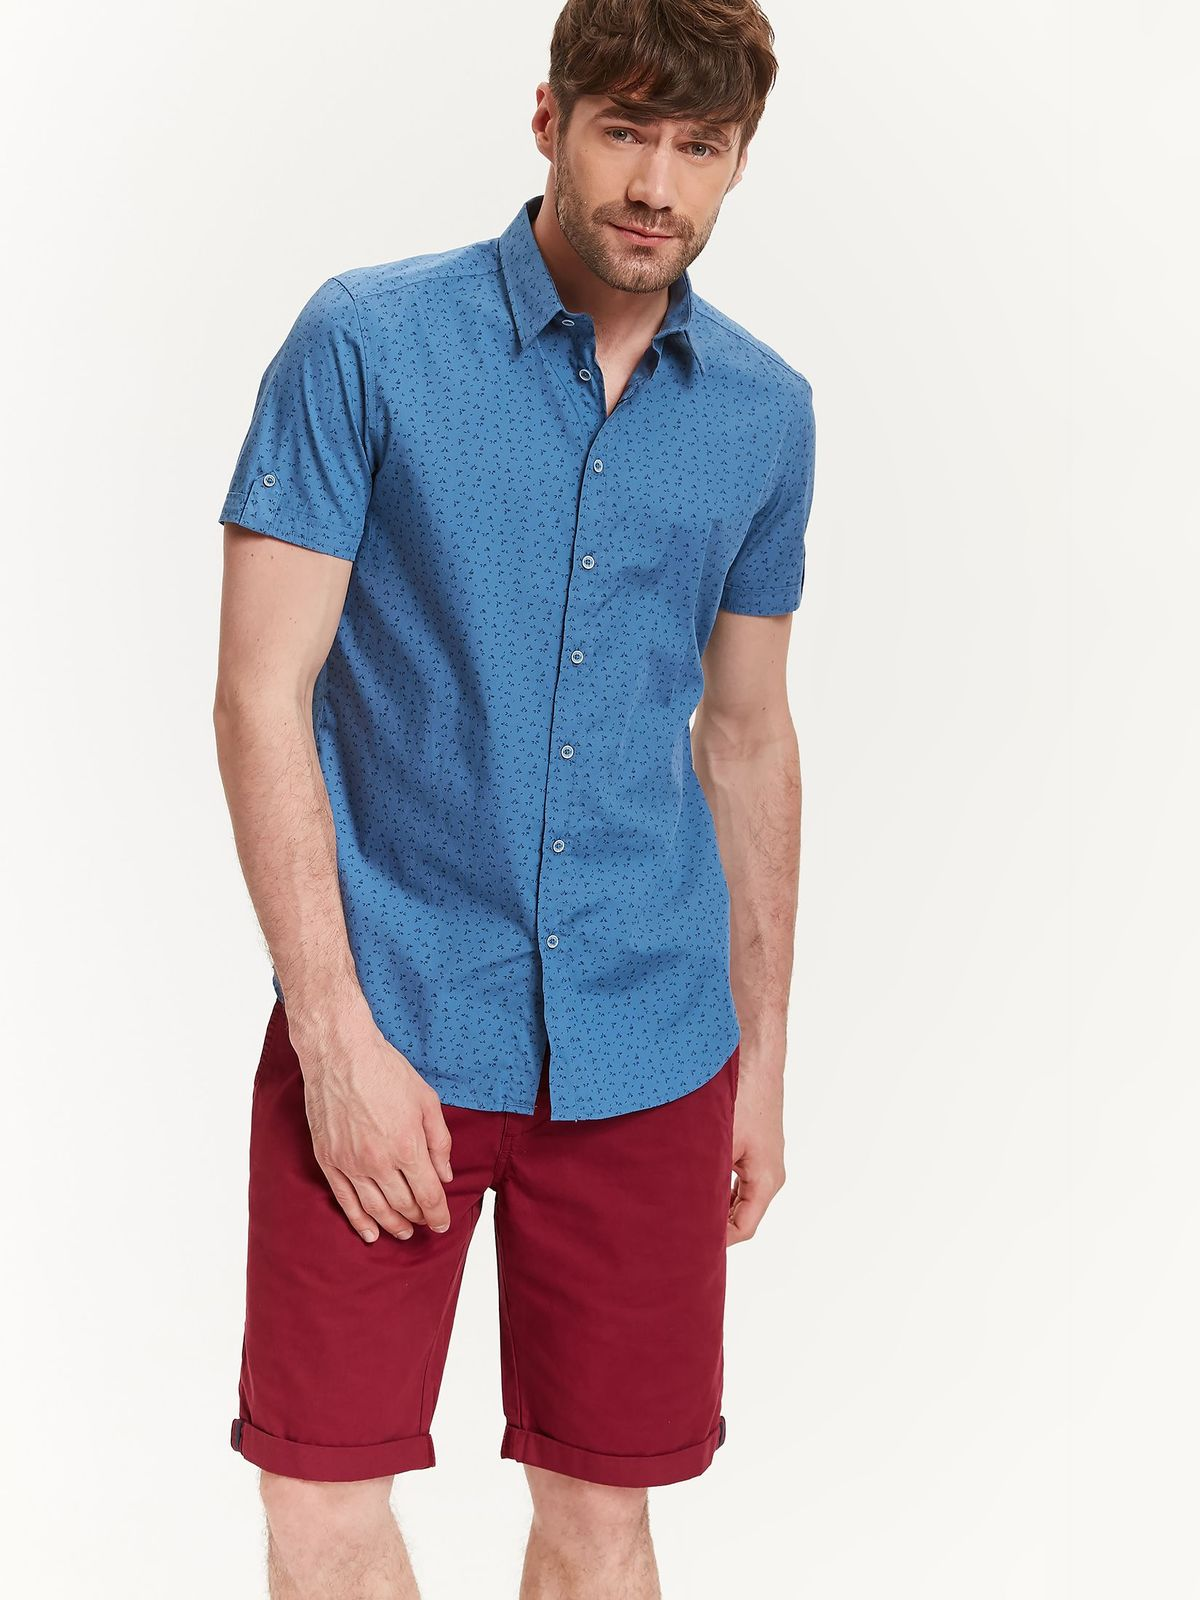 TOP SECRET TOP SECRET τζιν πουκαμισο